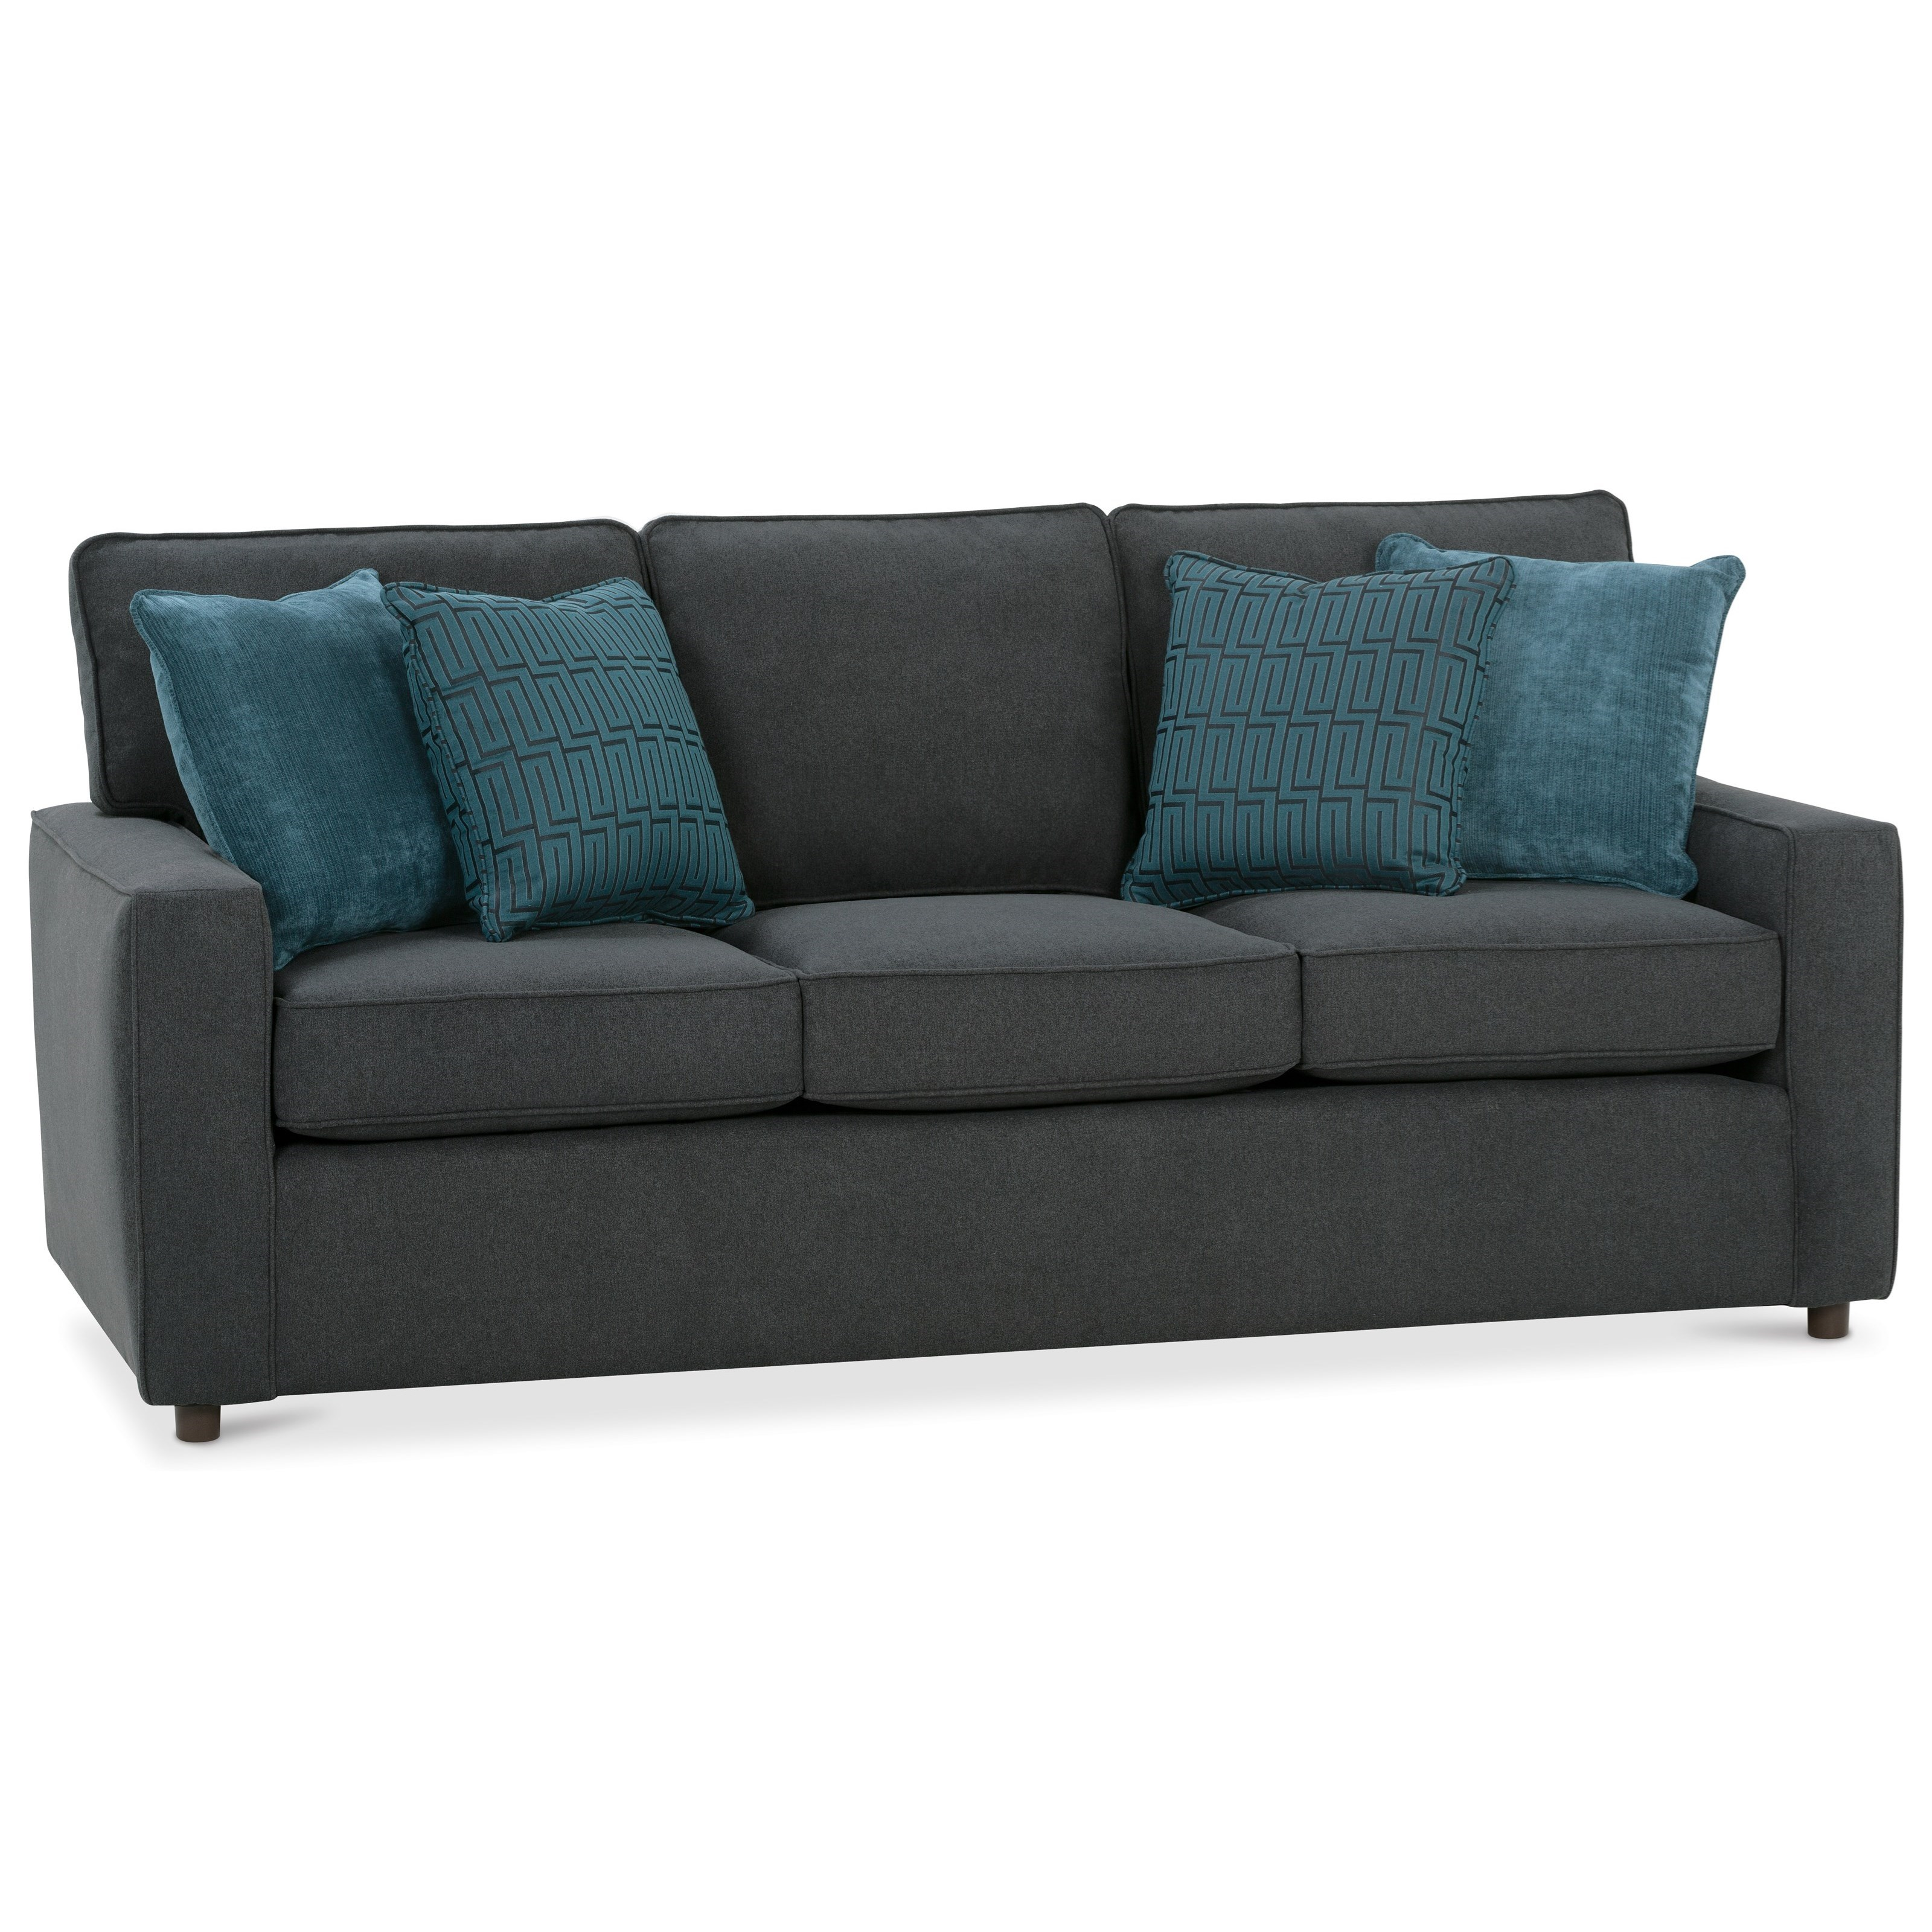 Rowe Monaco D180-000 Mini Upholstered Sofa